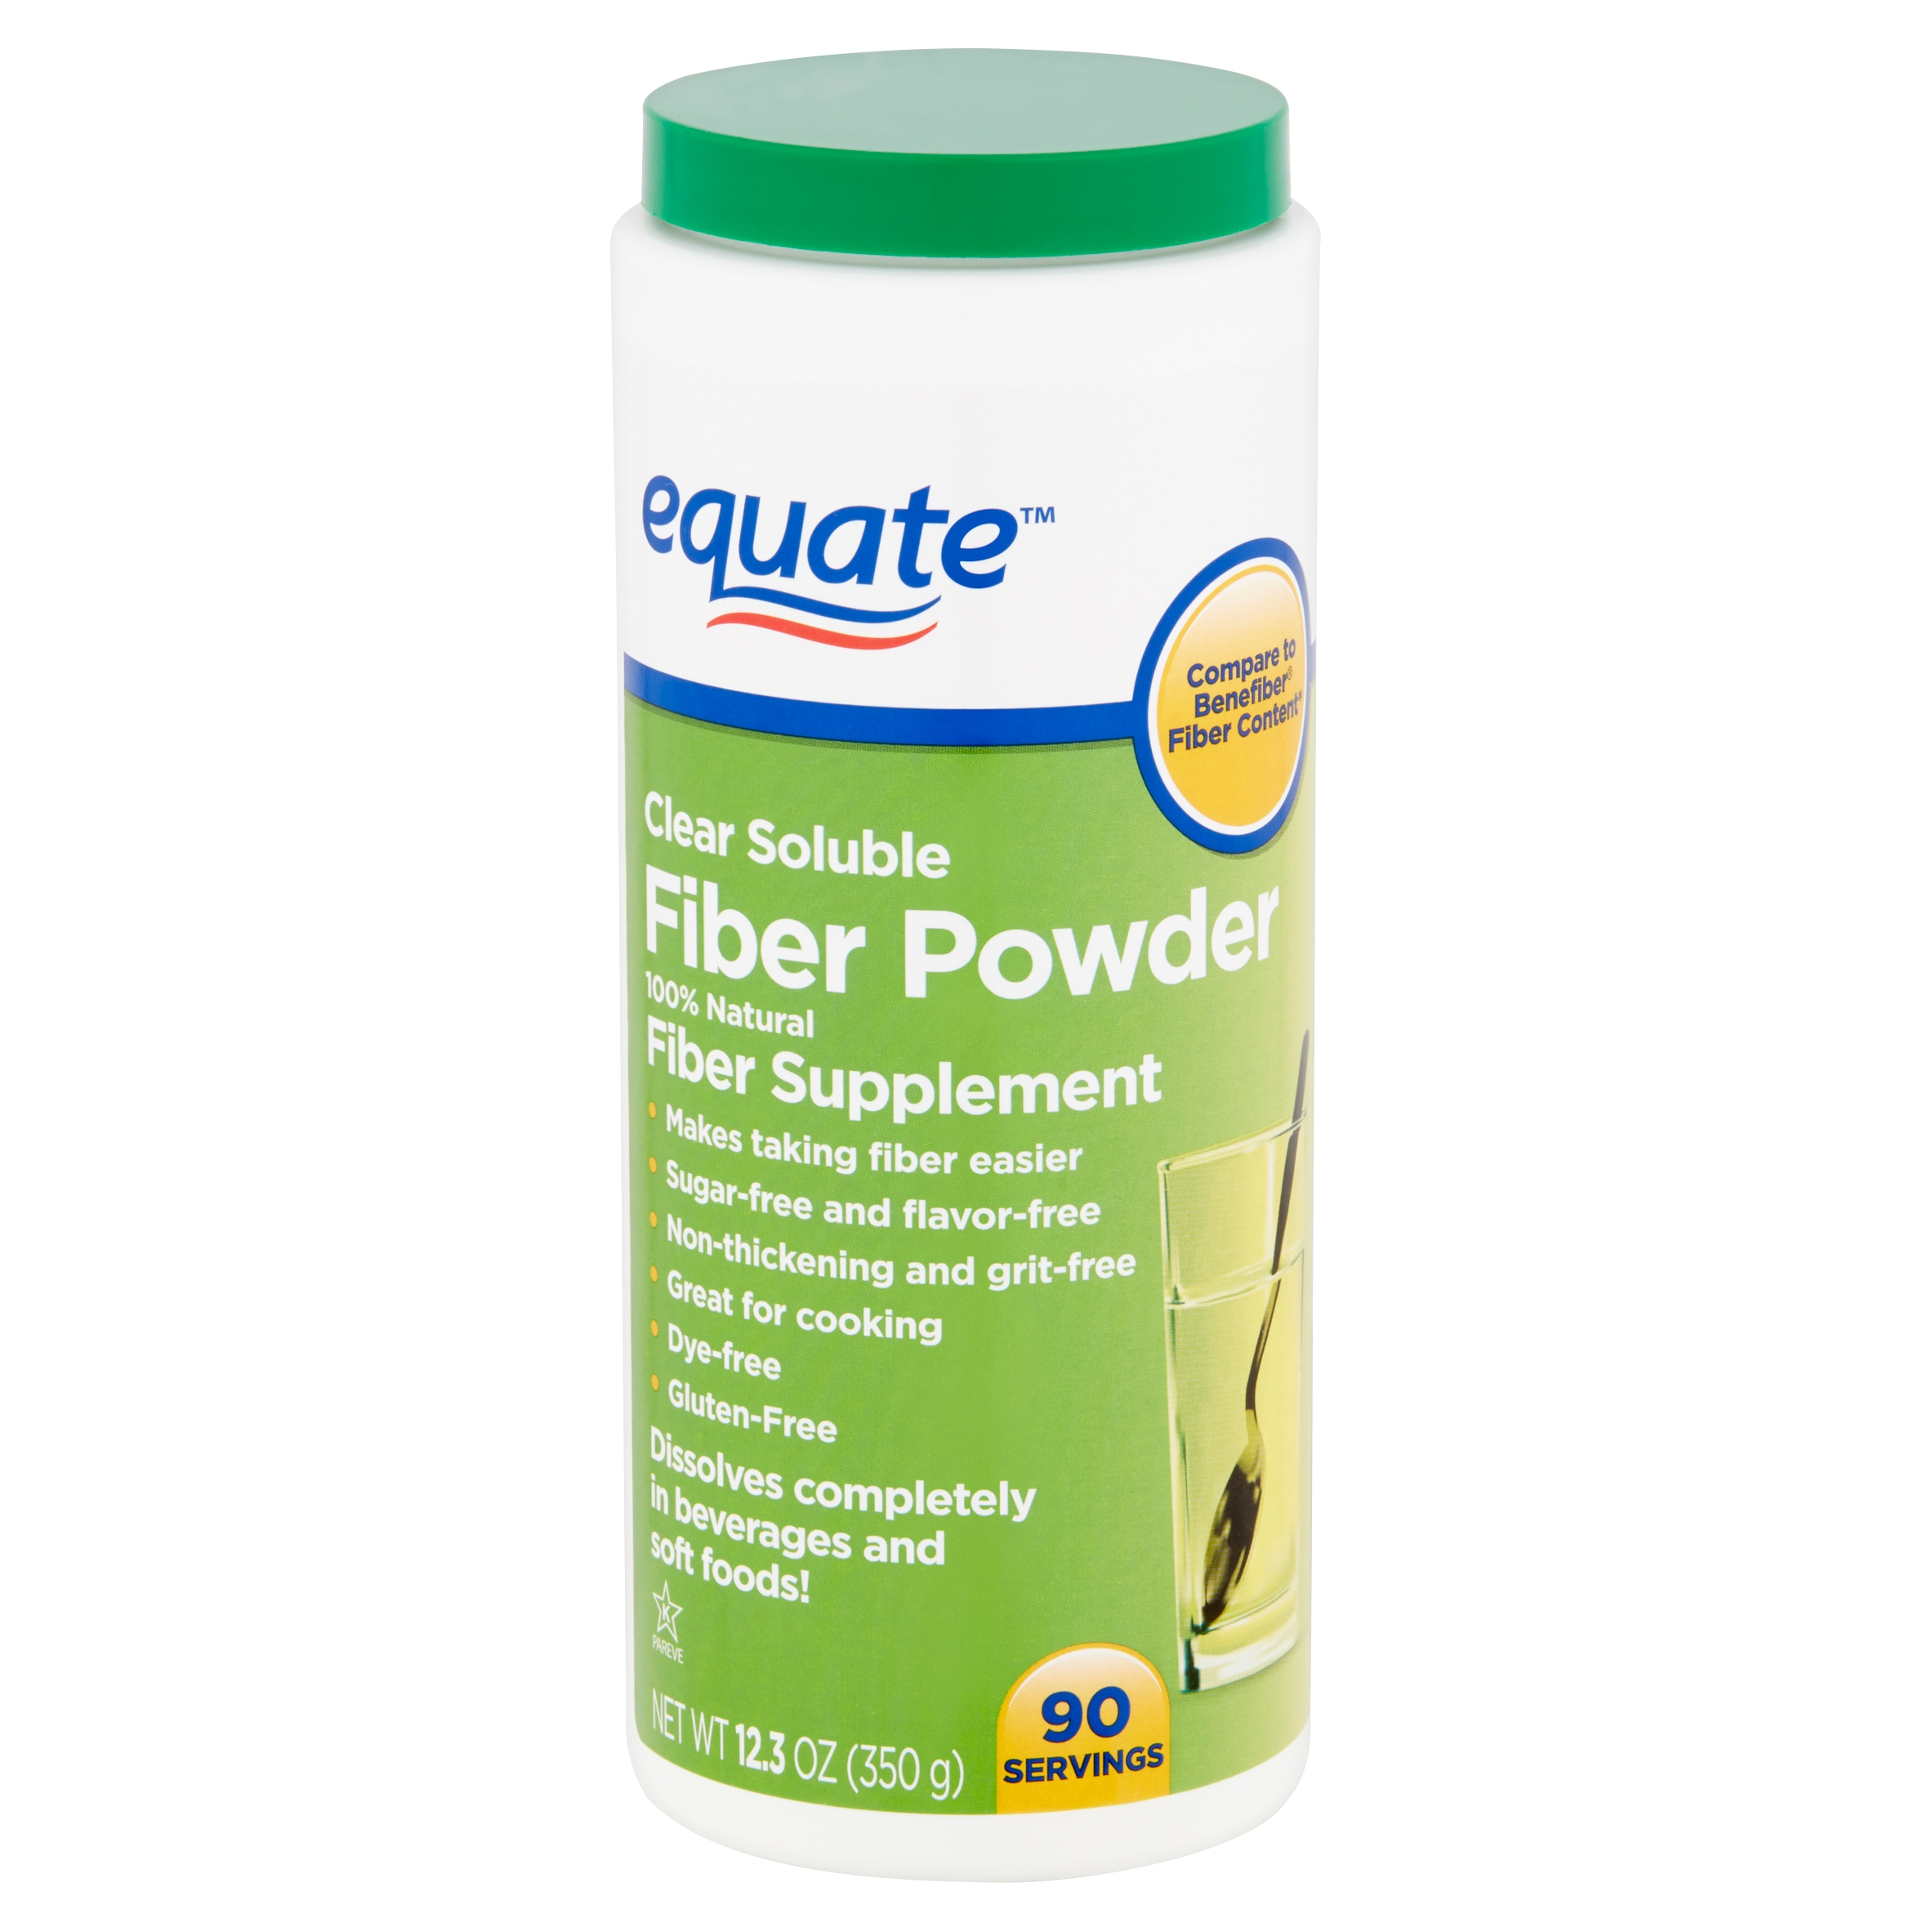 Equate Clear Soluble Fiber Powder 12 3 Oz Walmart Com Walmart Com